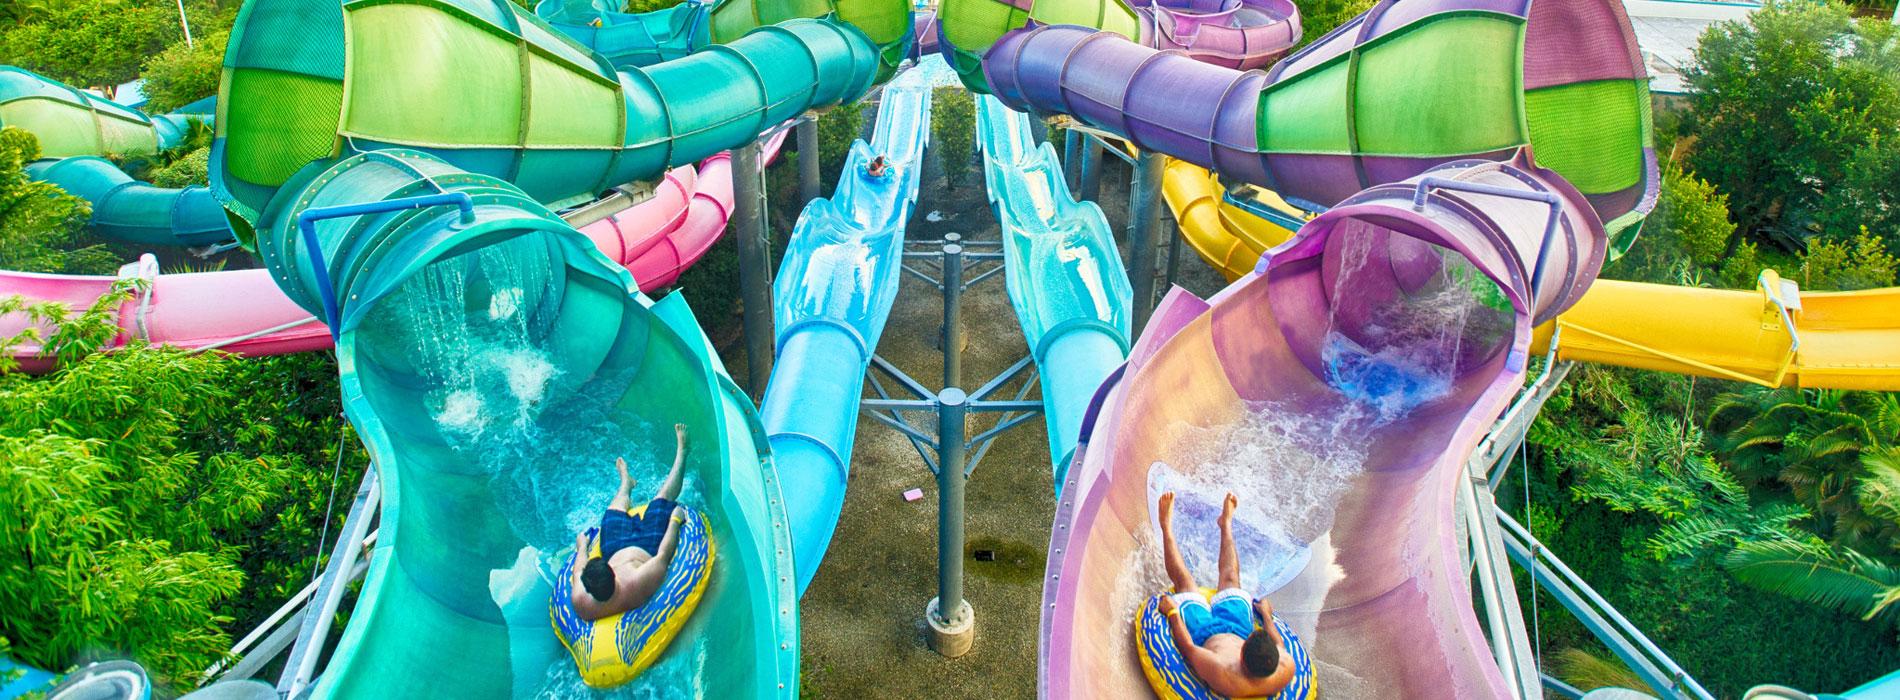 Swish and slide down Omaka Rocka at Aquatica